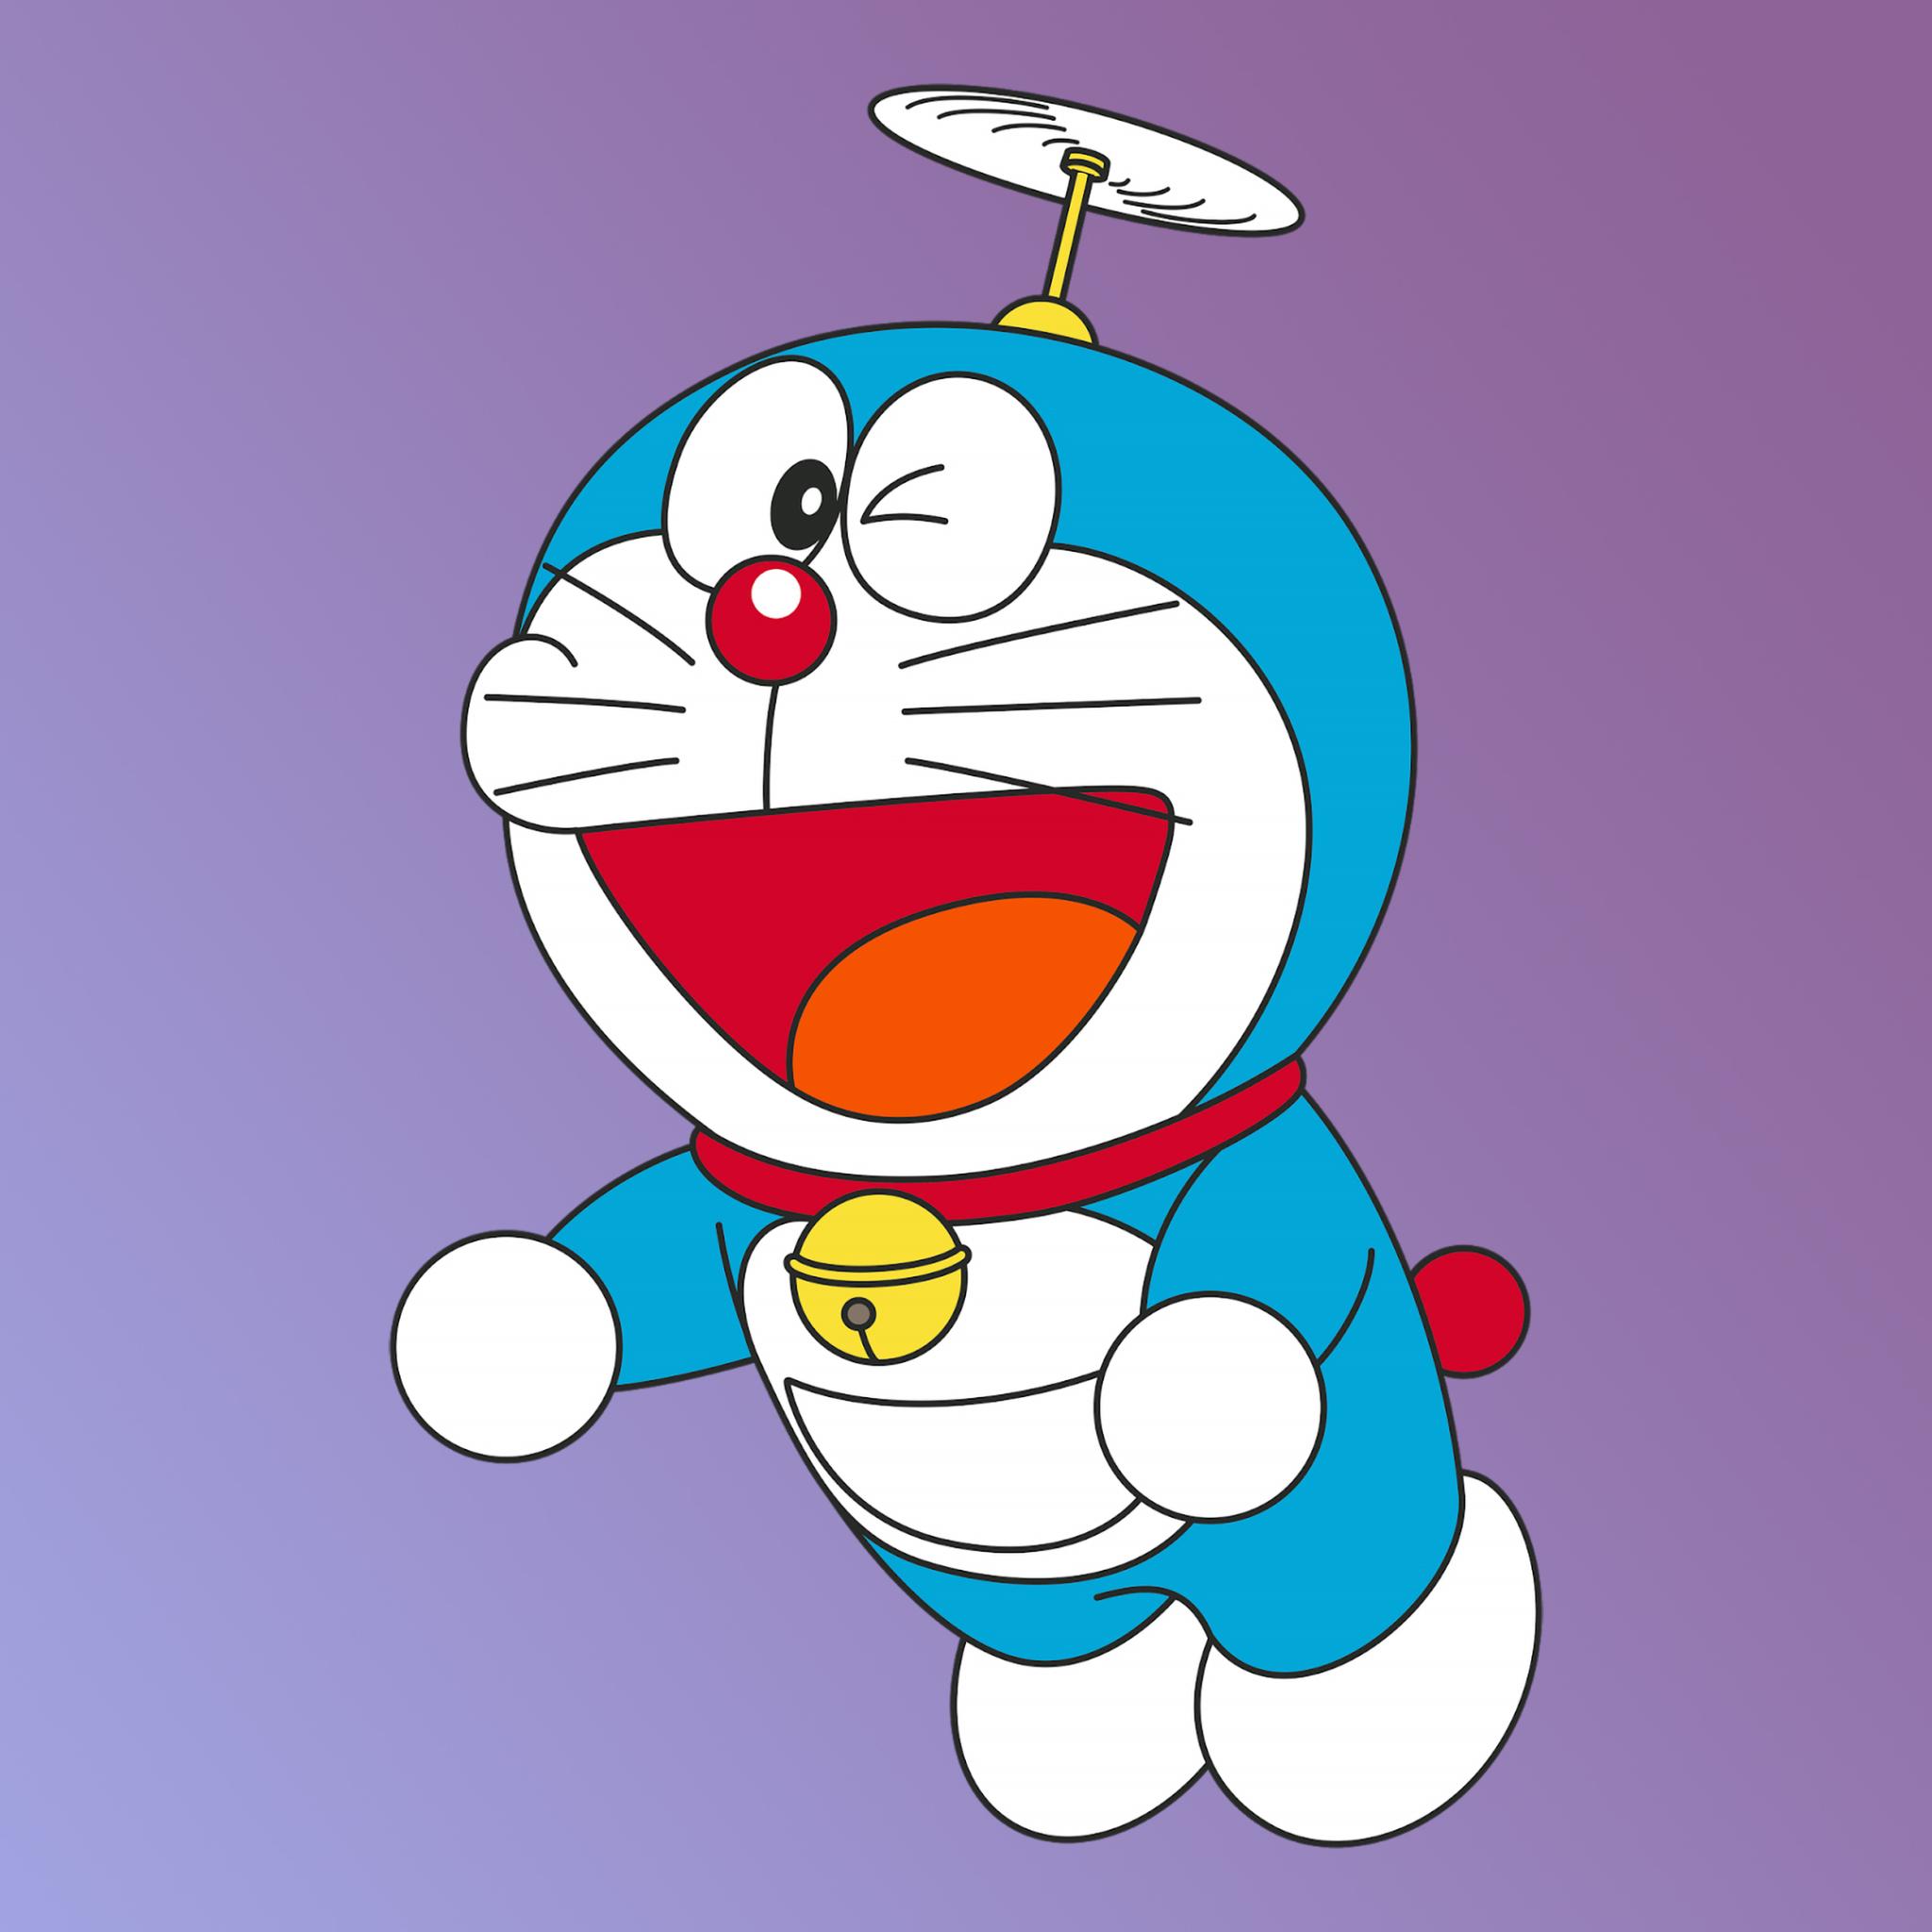 2048x2048 Doraemon Minimal 4K Ipad Air Wallpaper, HD ...